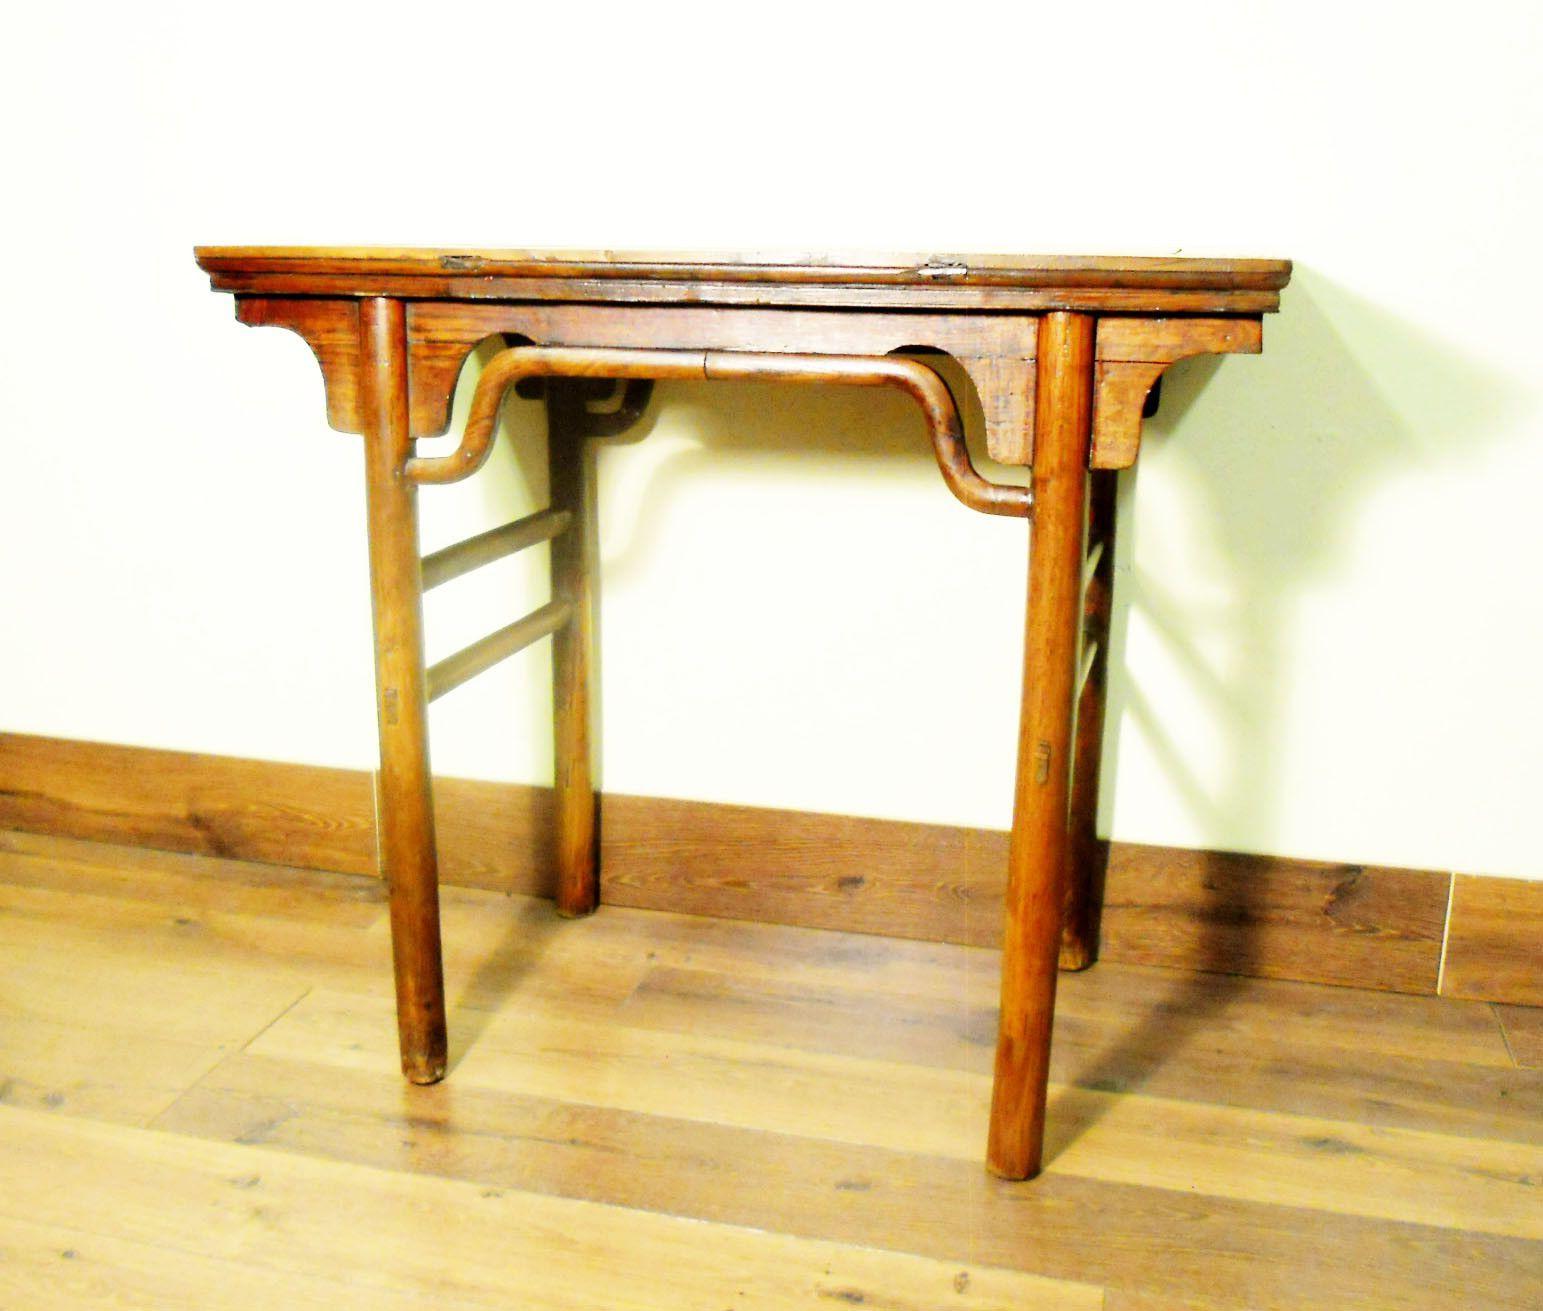 Antique chinese wine table 5367 circa 1800 1849 antique antique chinese wine table 5367 circa 1800 1849 geotapseo Gallery